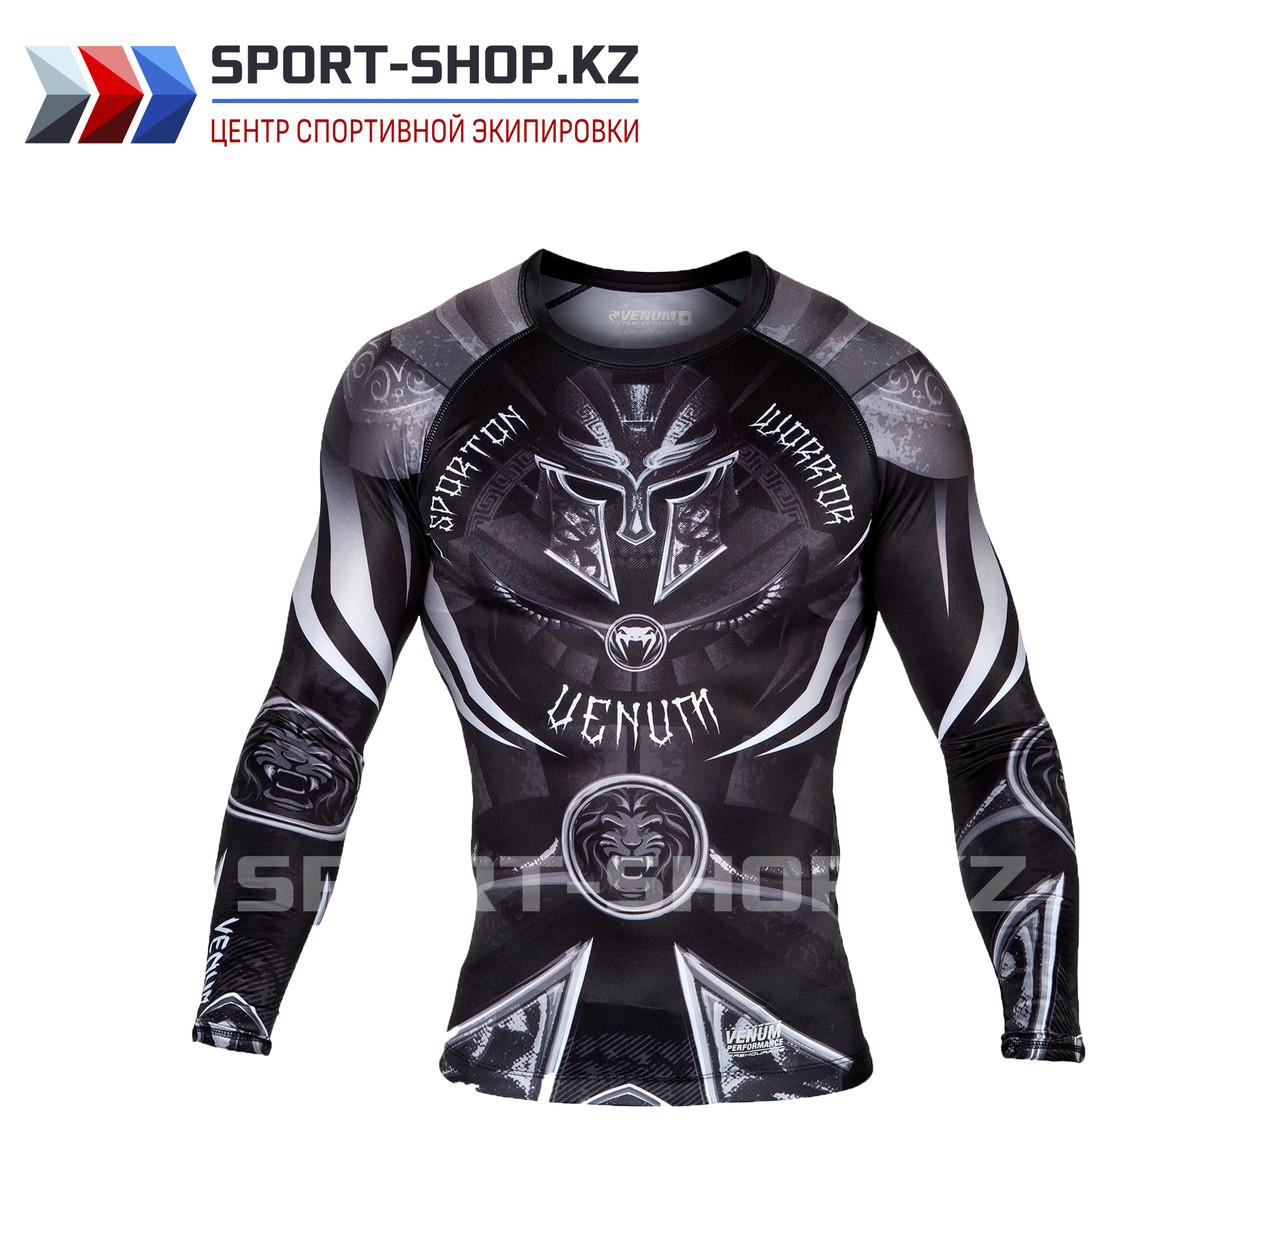 Рашгард Venum Gladiator 3.0 black white long sleeve